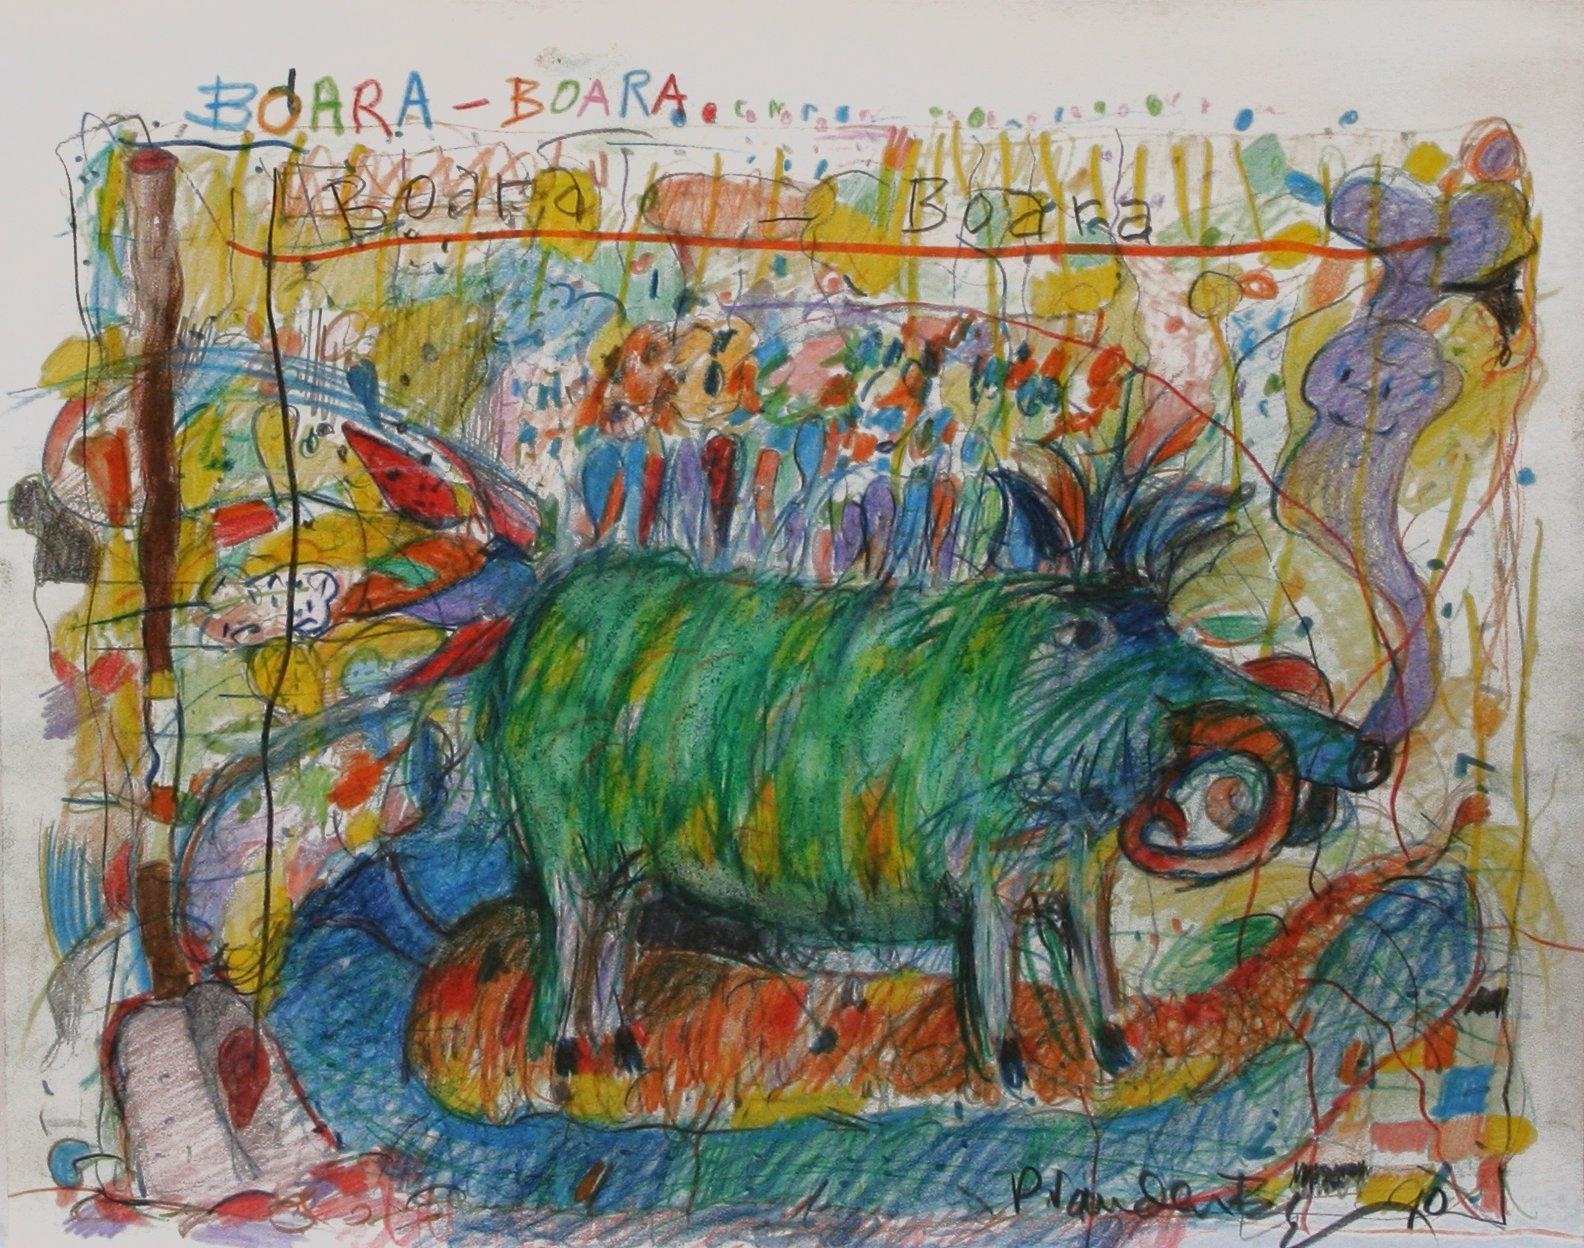 Peter VandenBerge Boara – Boara